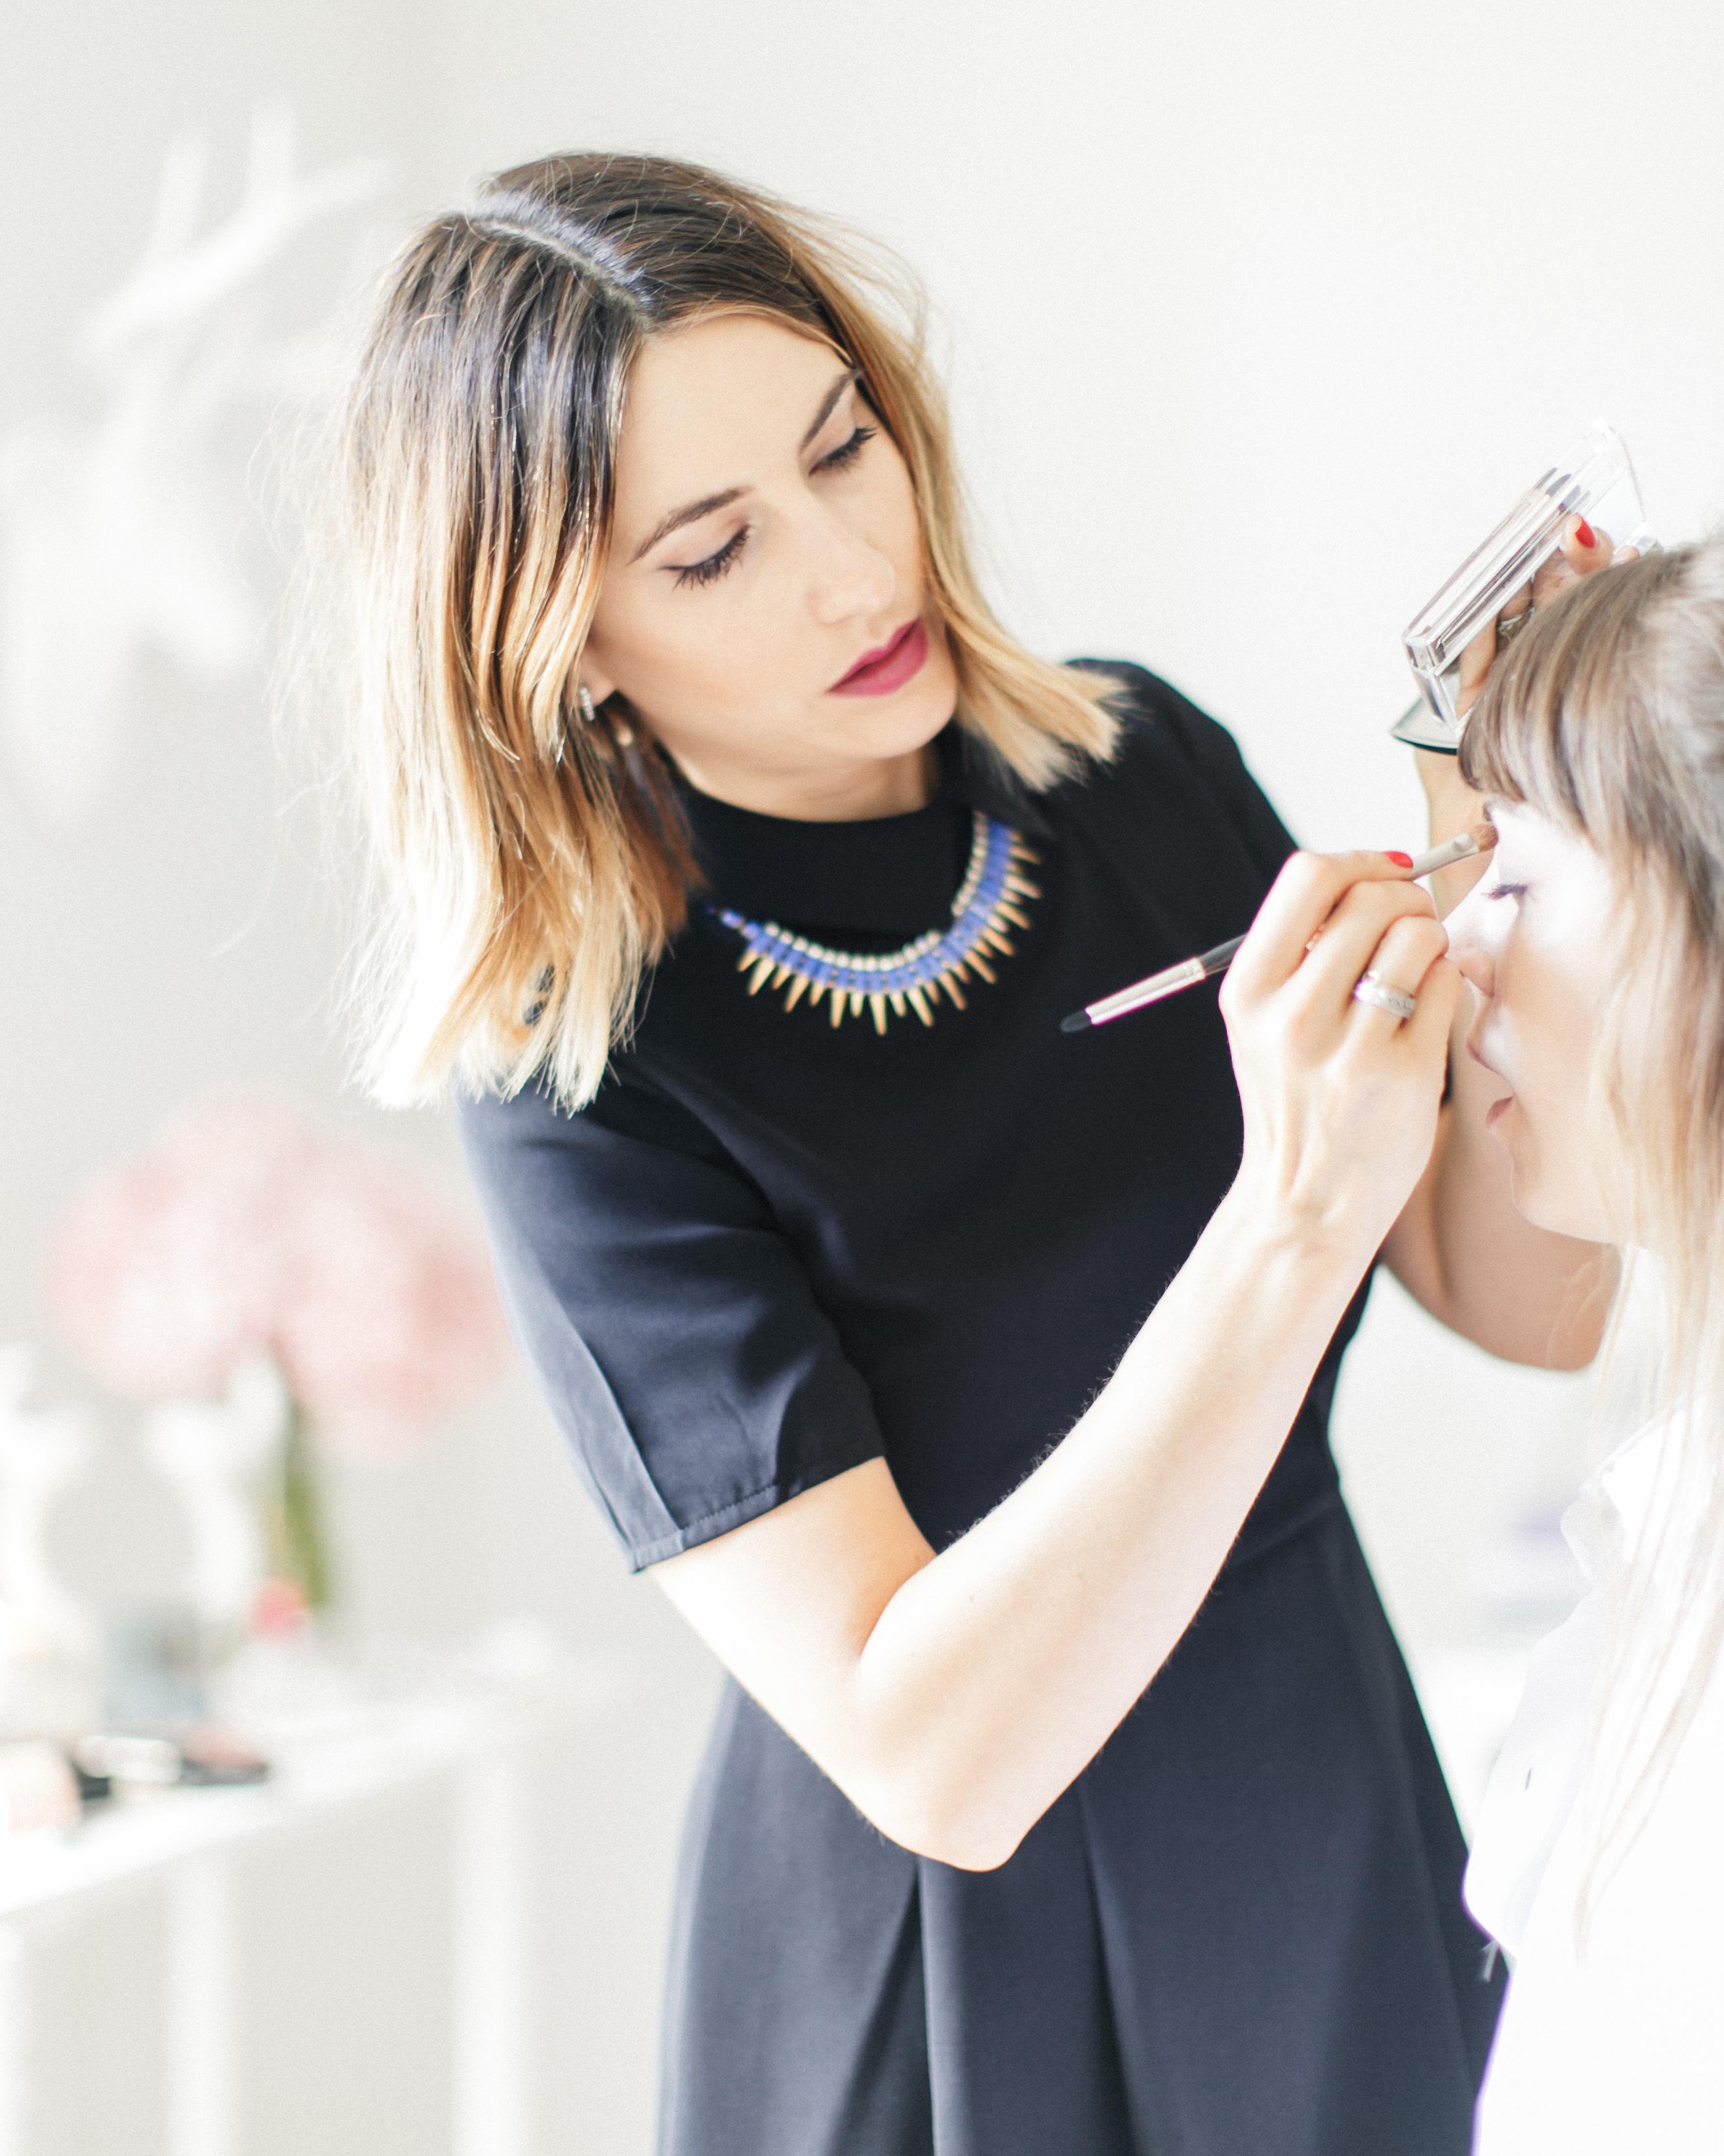 jenny-bernheim-beauty-makeupartist-68-s112662-1015.jpg